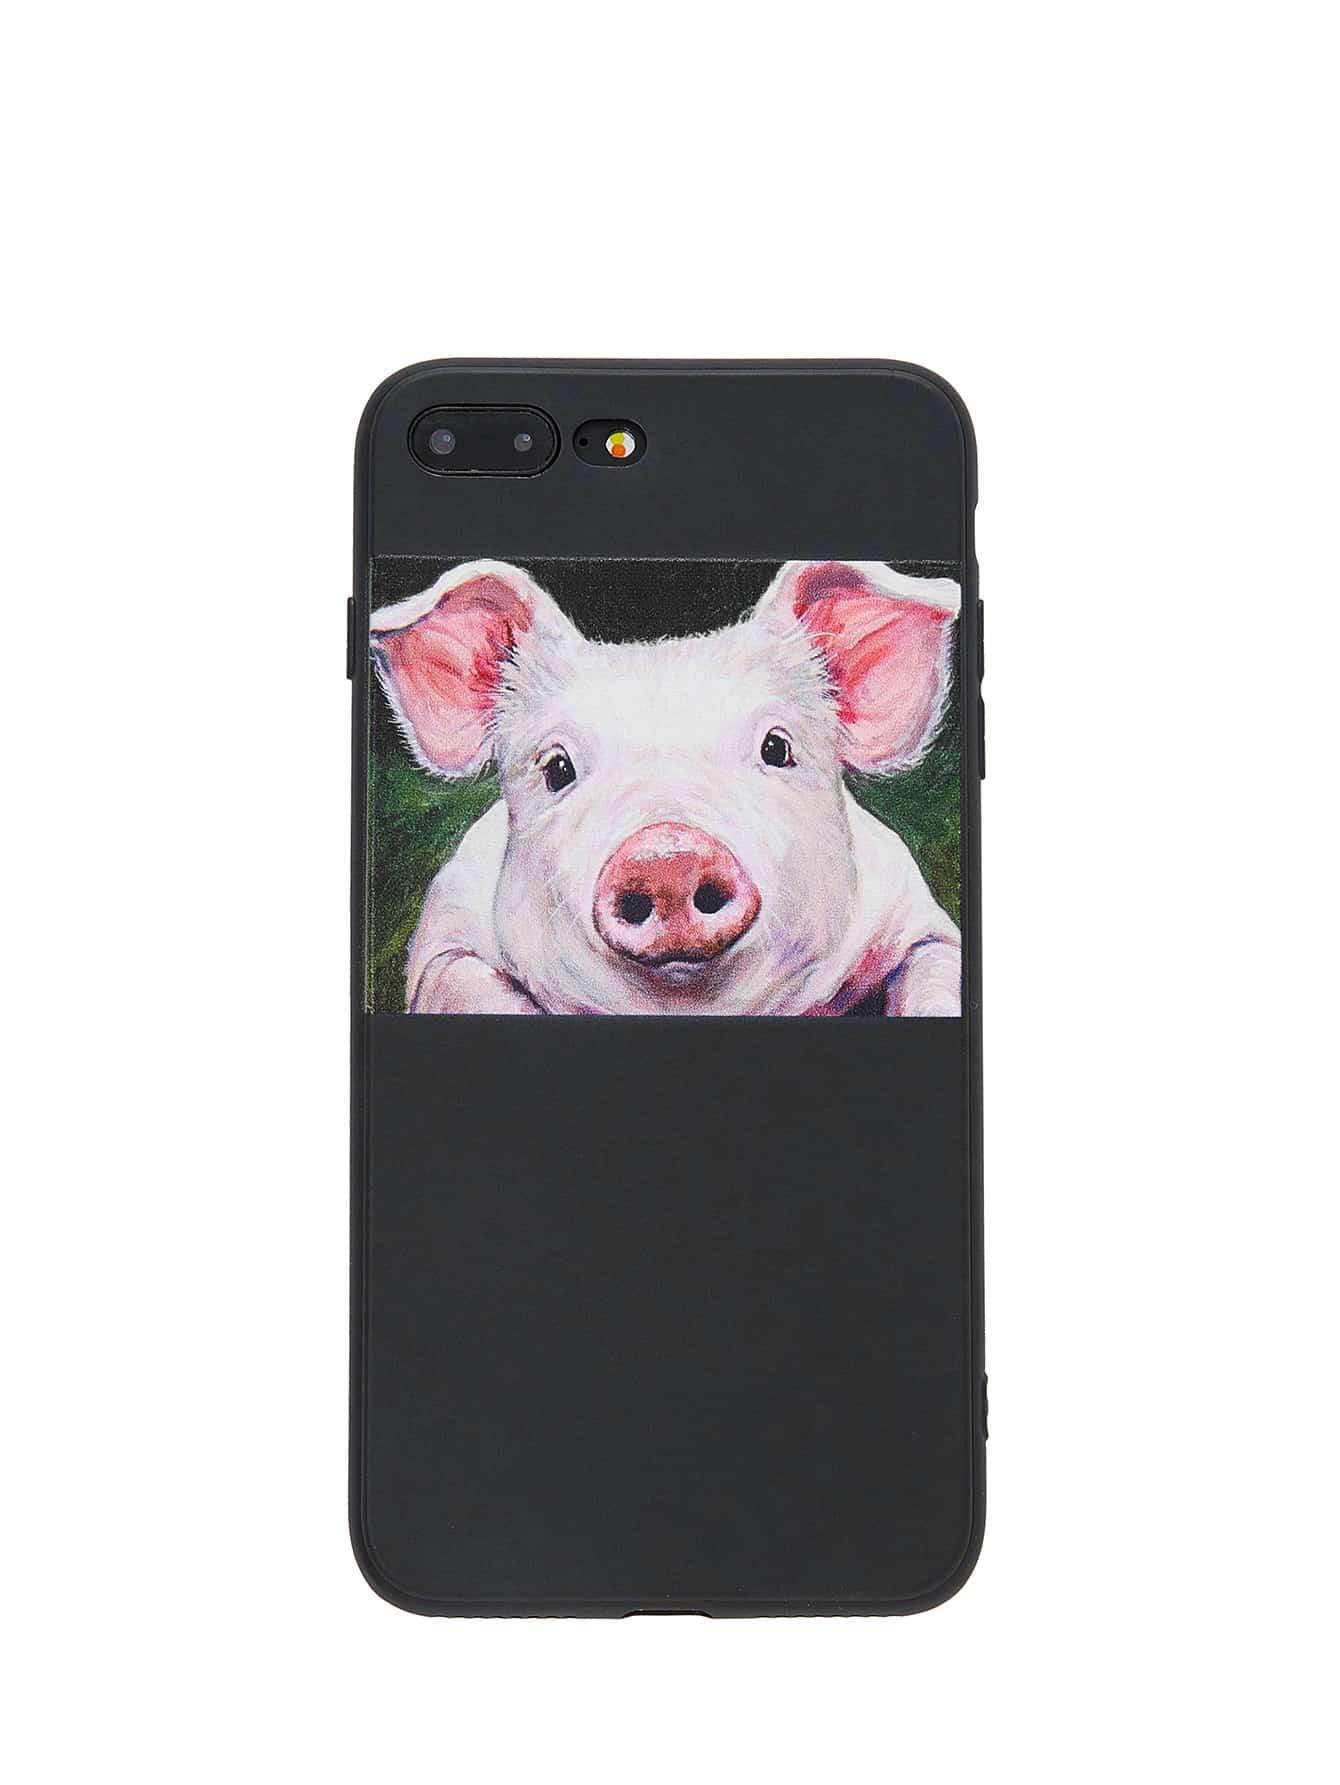 Pig Print iPhone Case planet print iphone case